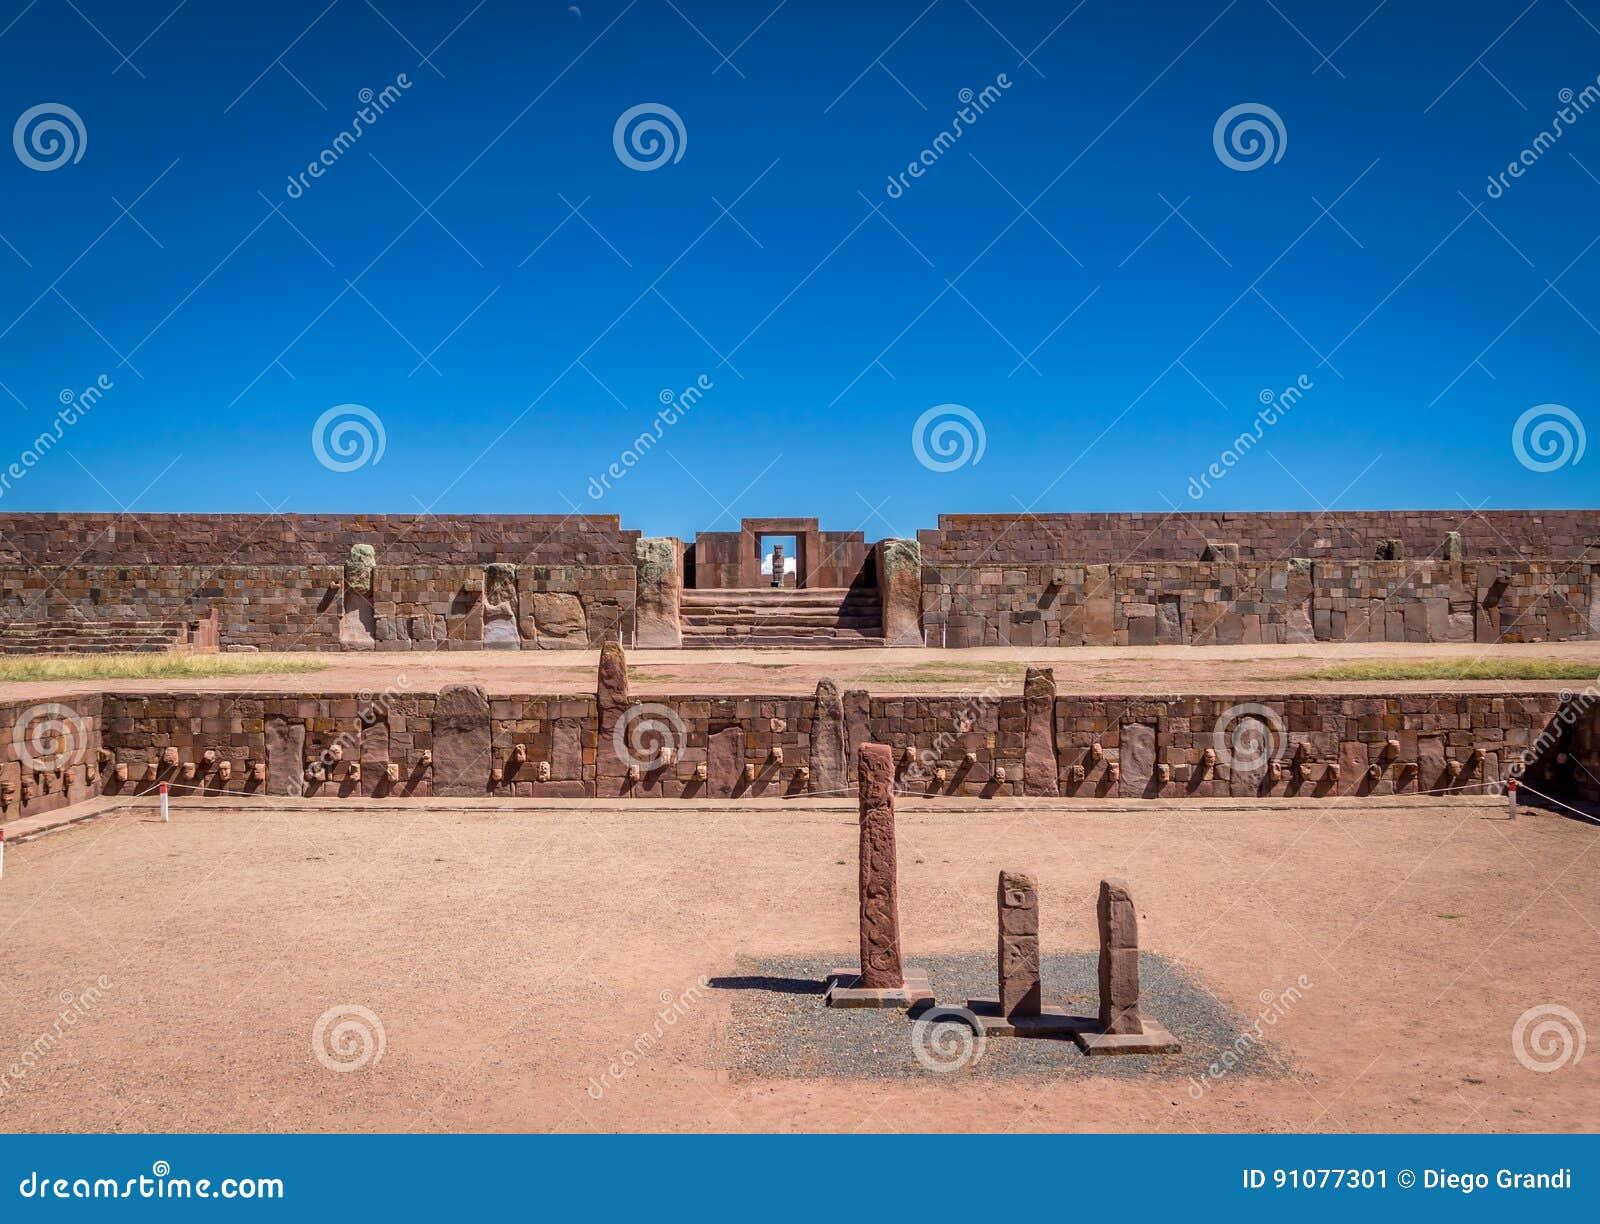 Ruins of Tiwanaku Tiahuanaco, Pre-Columbian archaeological site - La Paz, Bolivia